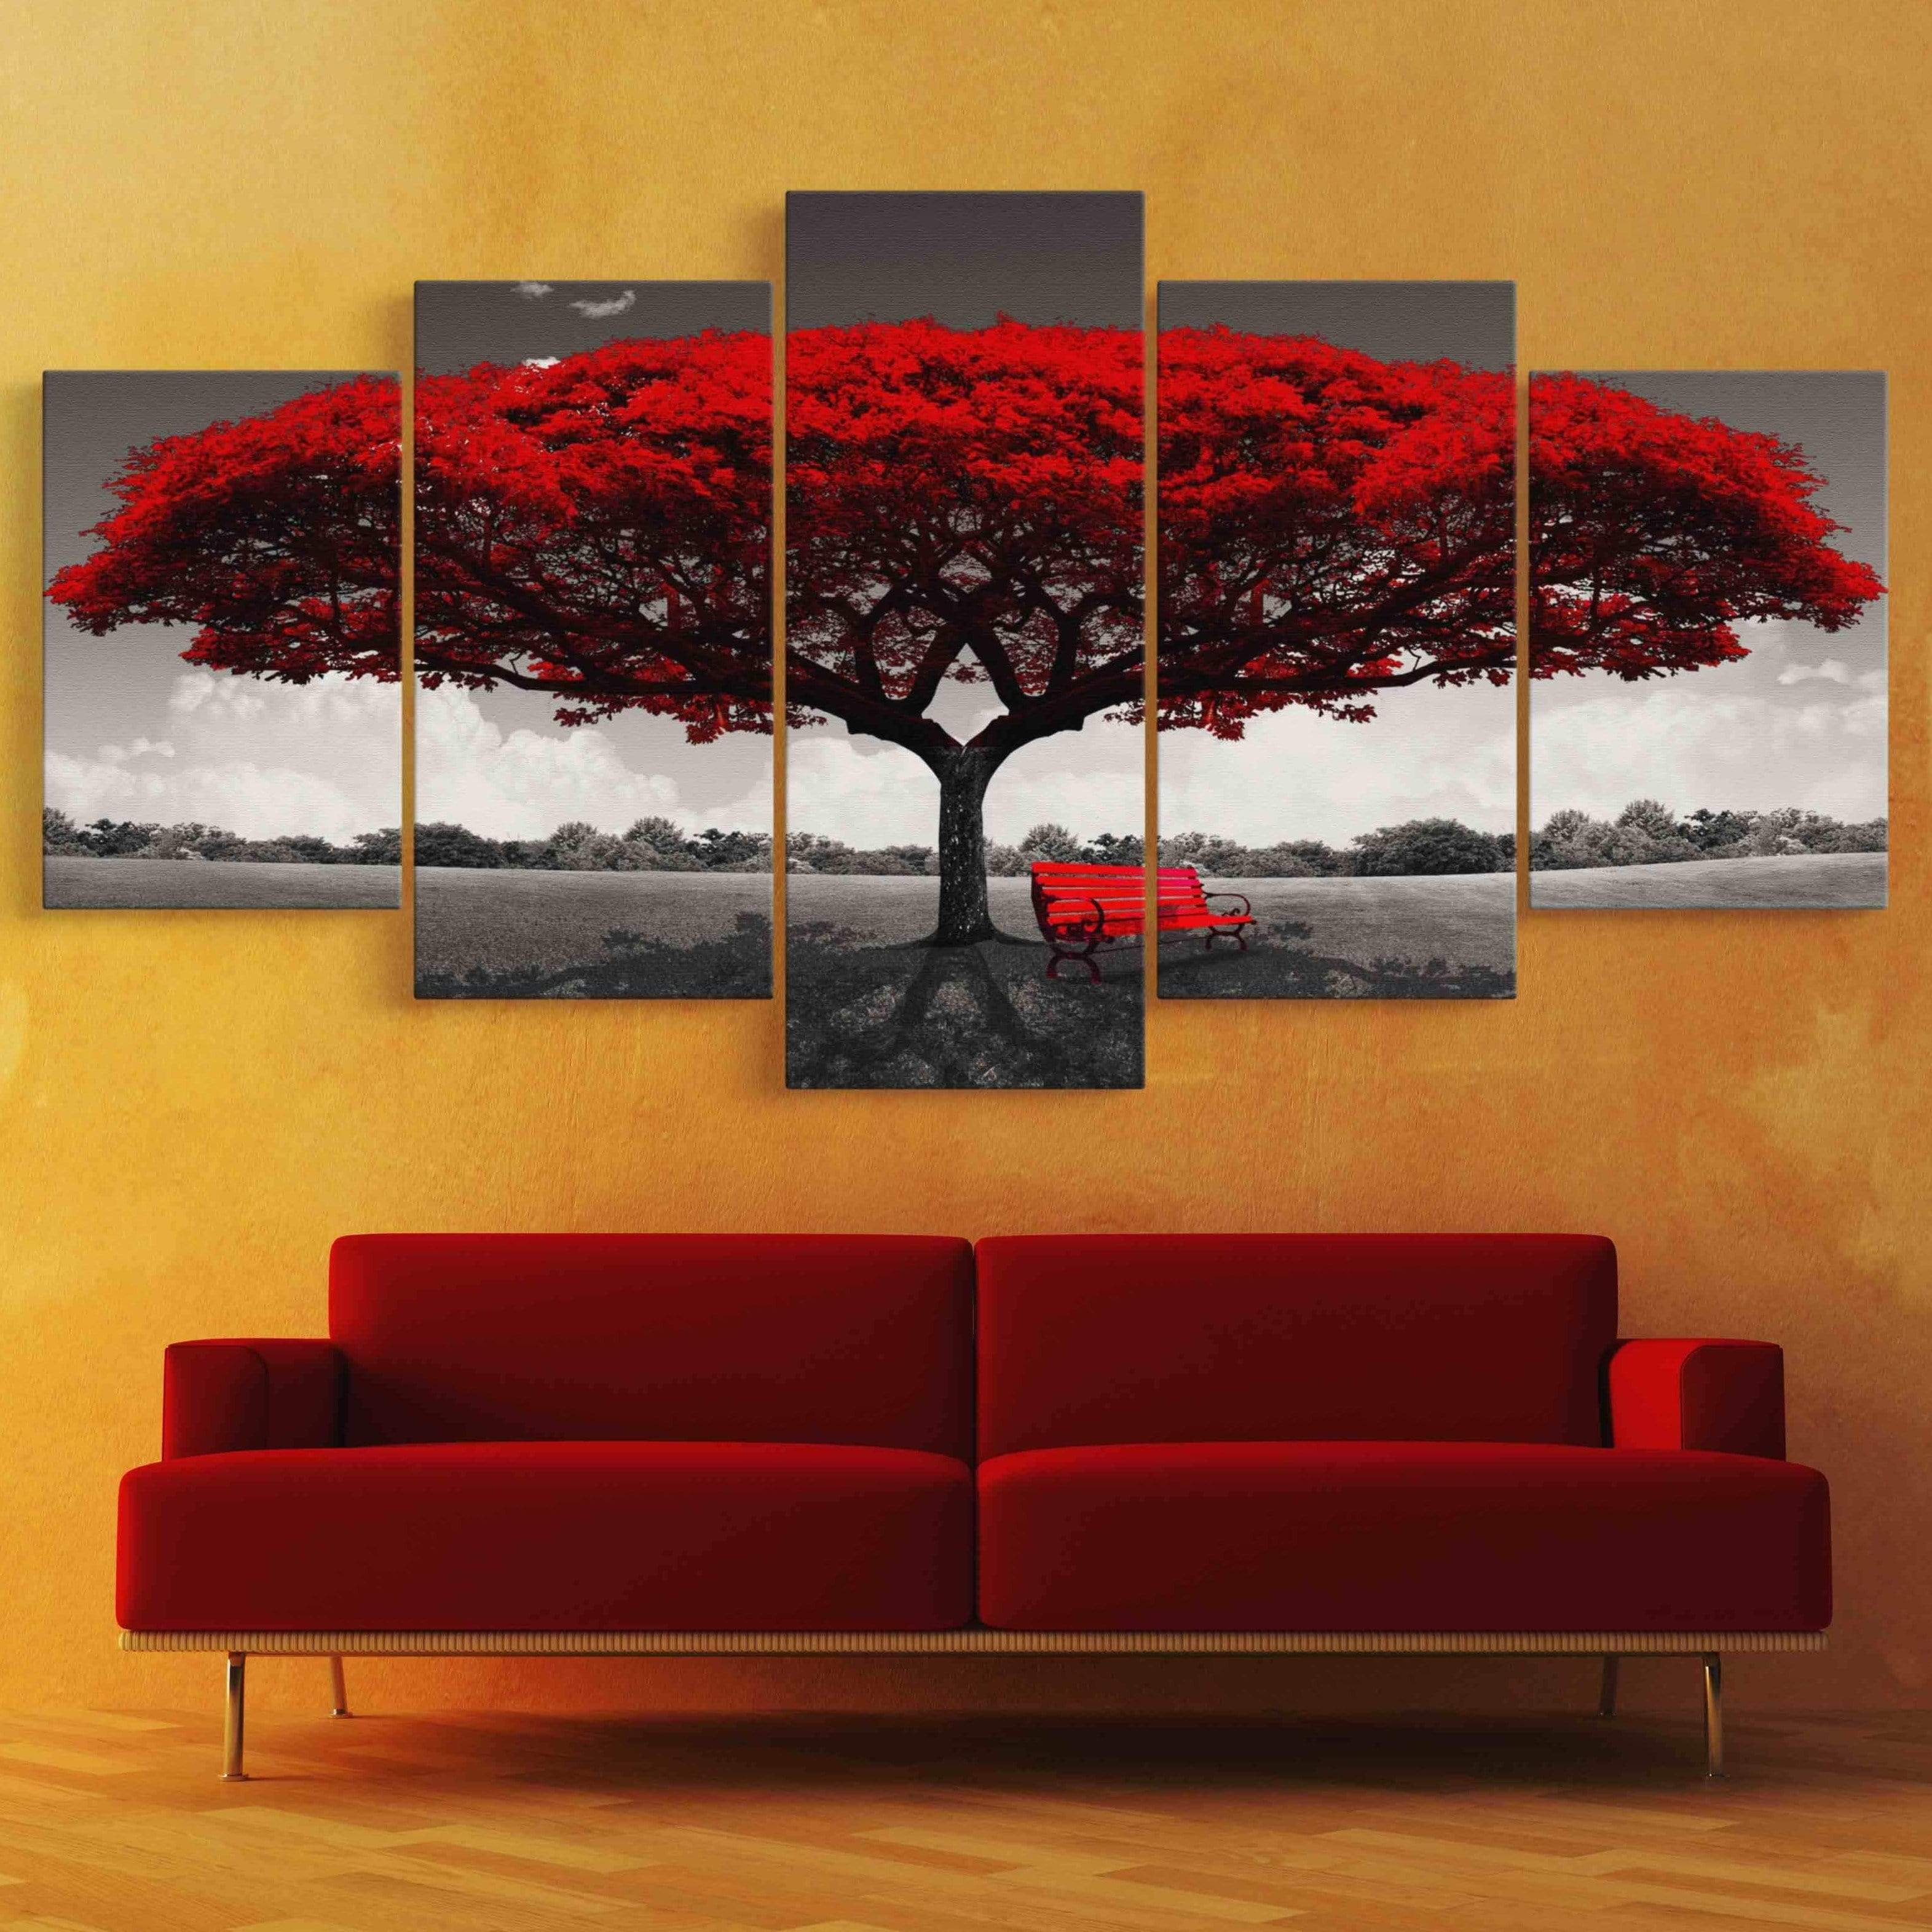 Romantic Tree 5 panel wall art canvas